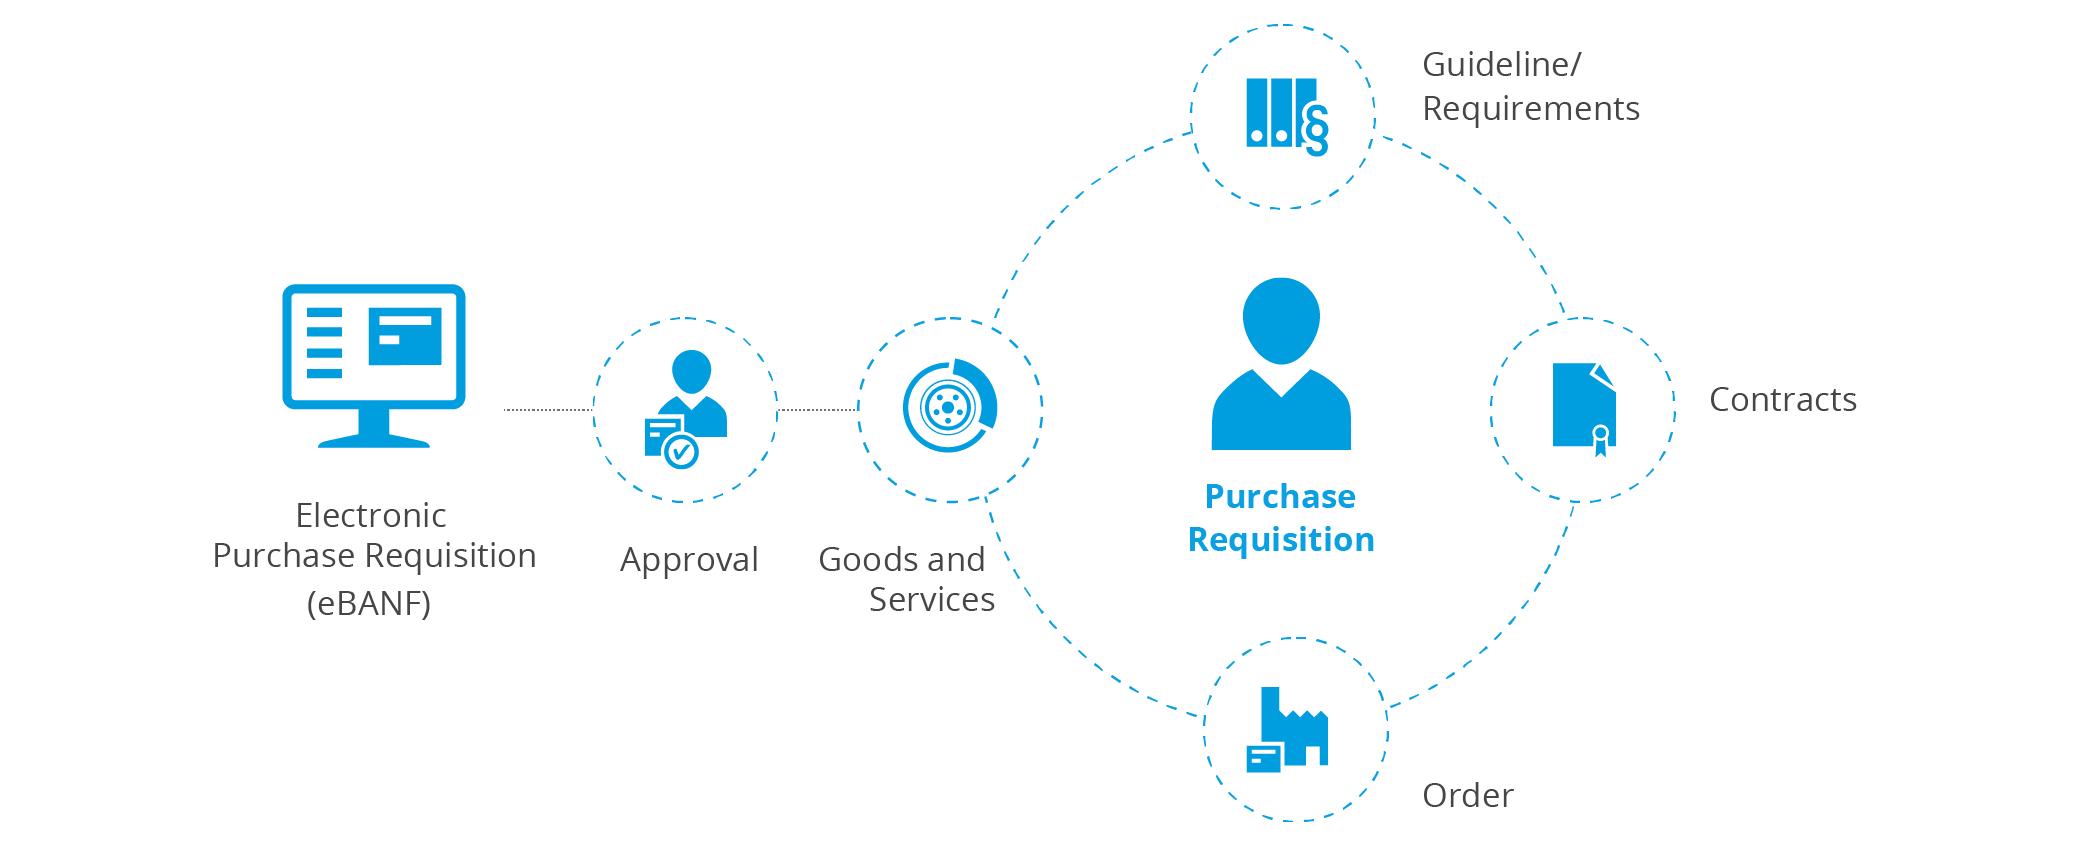 Procurement processes - electronic purchase requisition